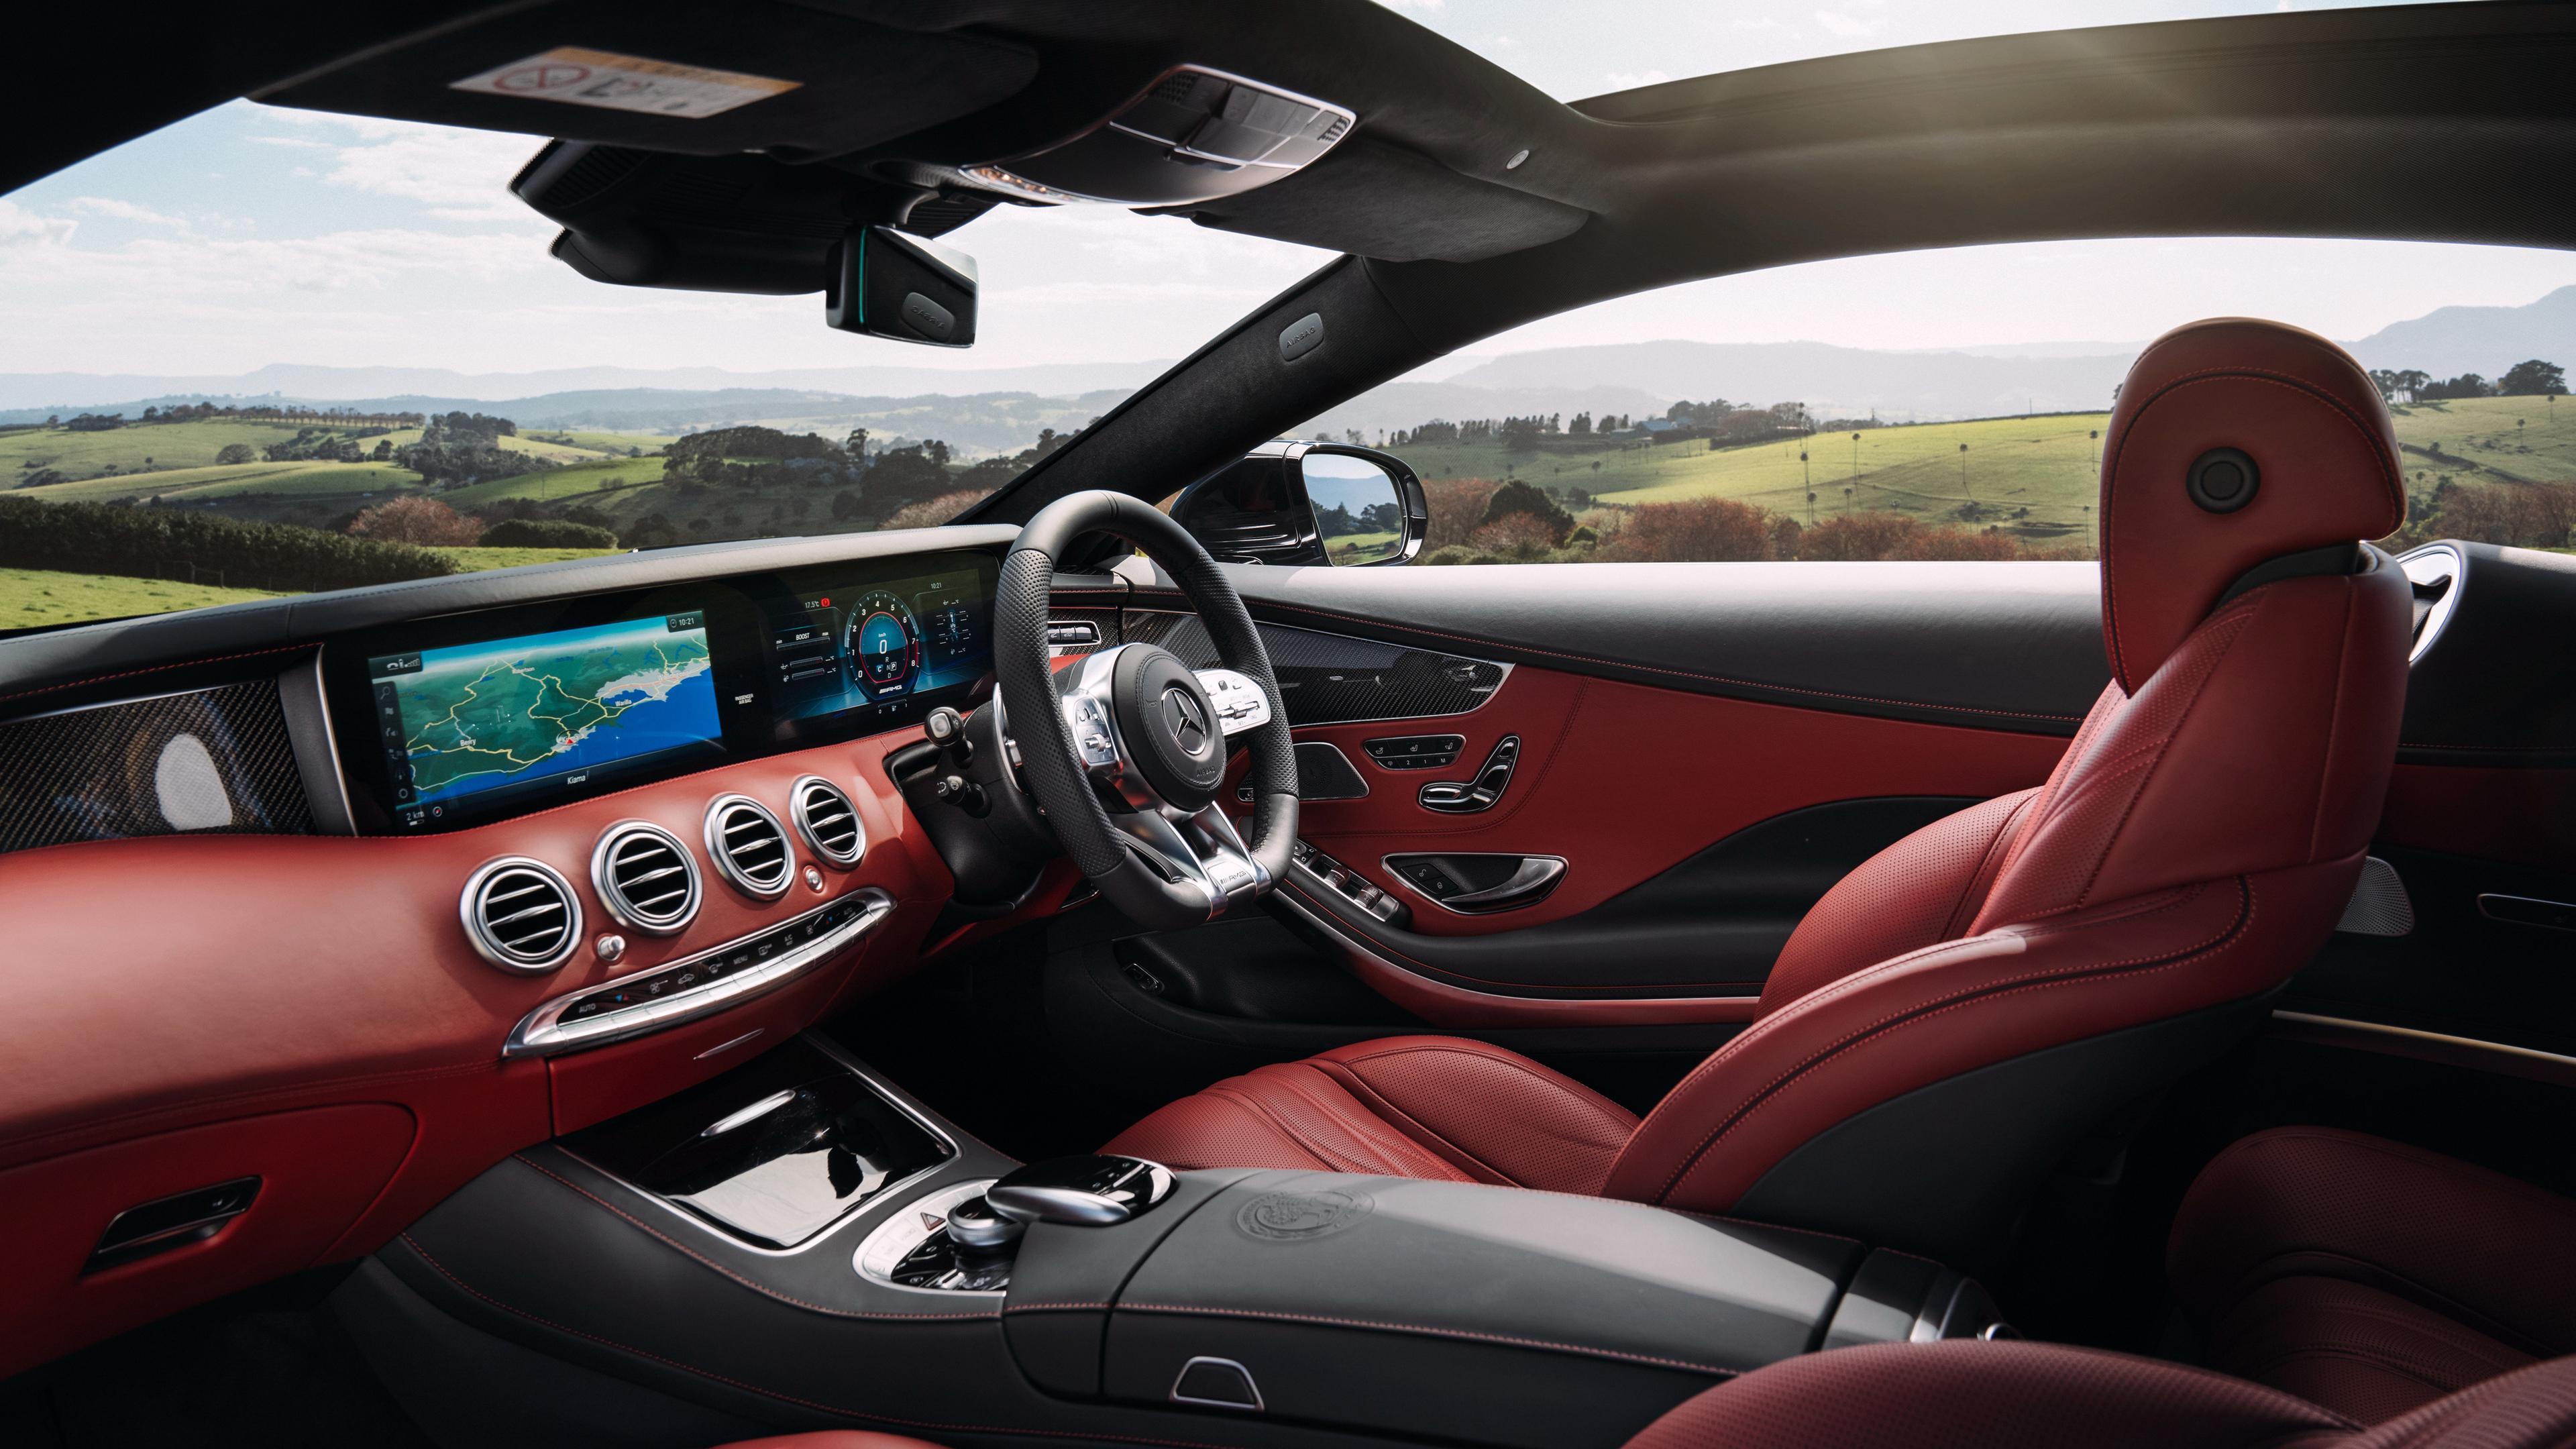 mercedes amg s63 2018 interior 1539114397 - Mercedes AMG S63 2018 Interior - mercedes wallpapers, mercedes s class wallpapers, mercedes benz wallpapers, interior wallpapers, hd-wallpapers, cars wallpapers, 4k-wallpapers, 2018 cars wallpapers